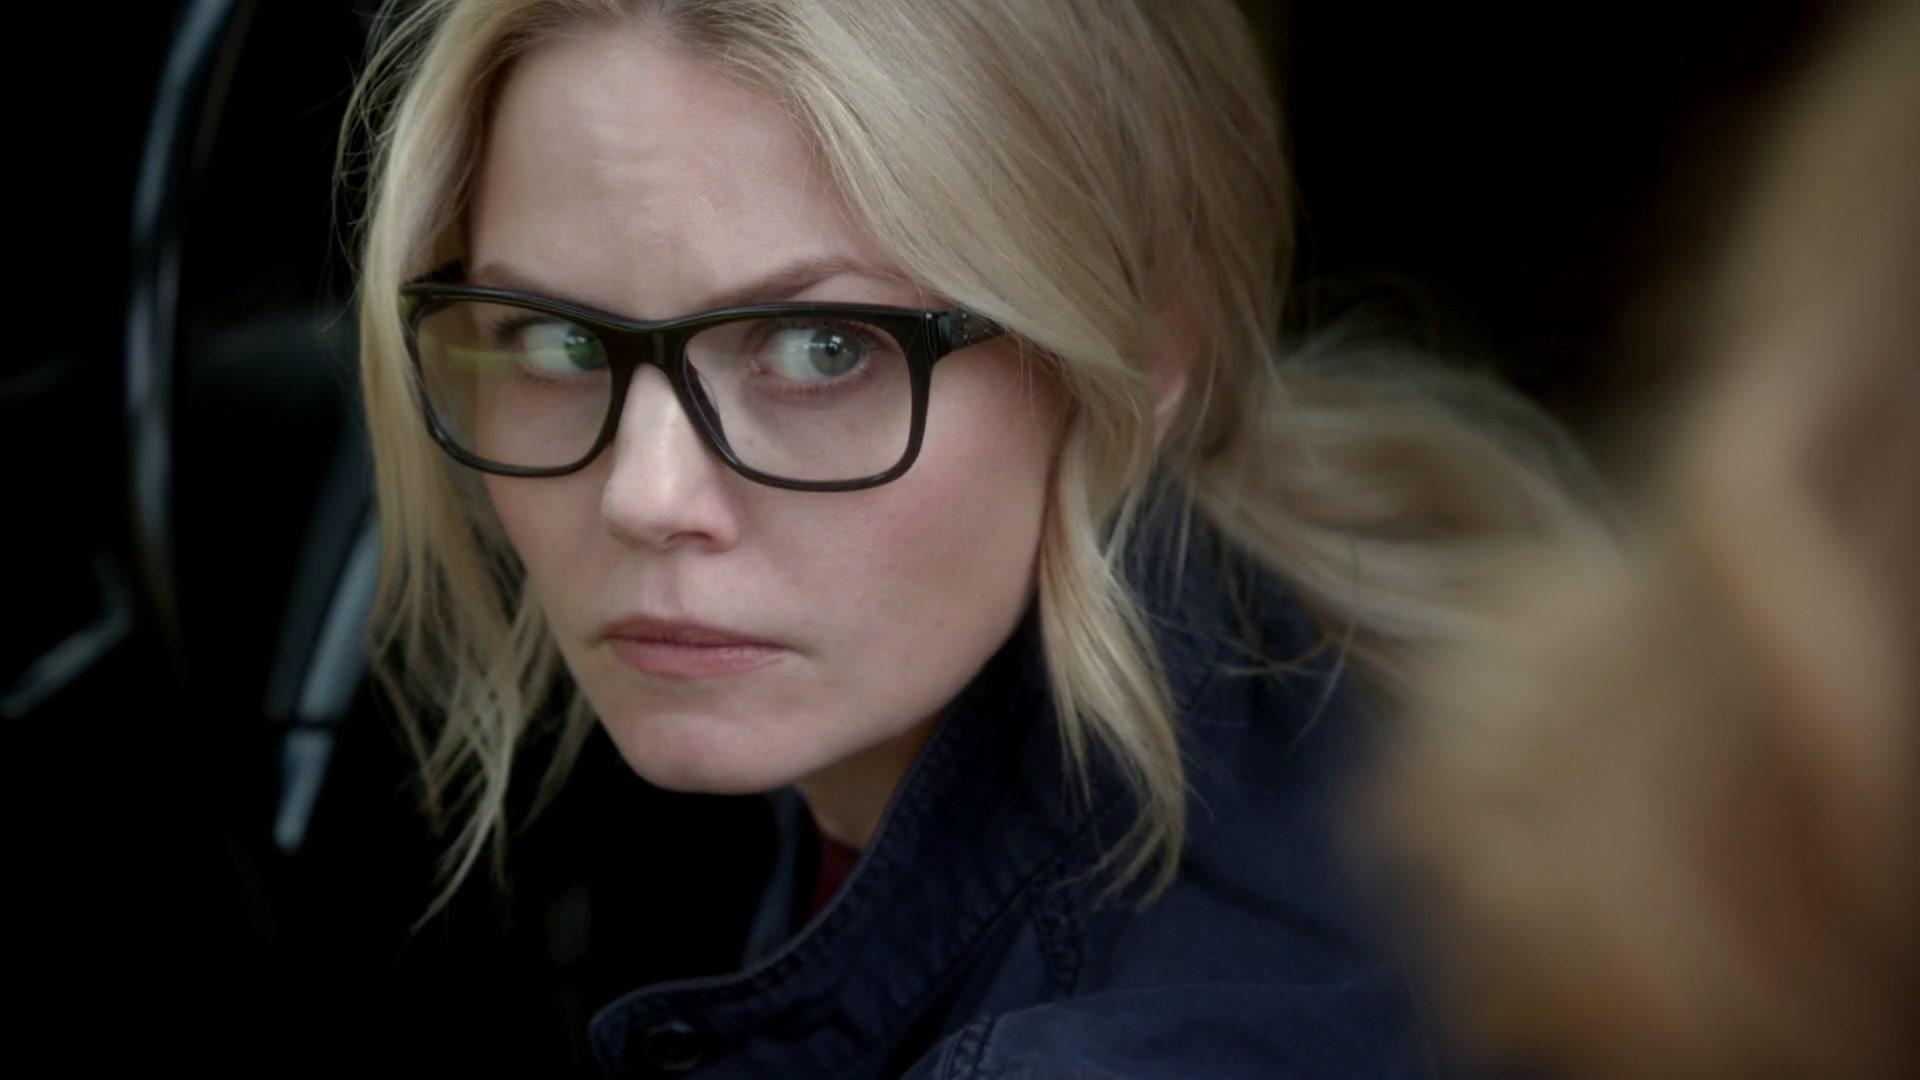 Emma (Jennifer Morrison) is on the run